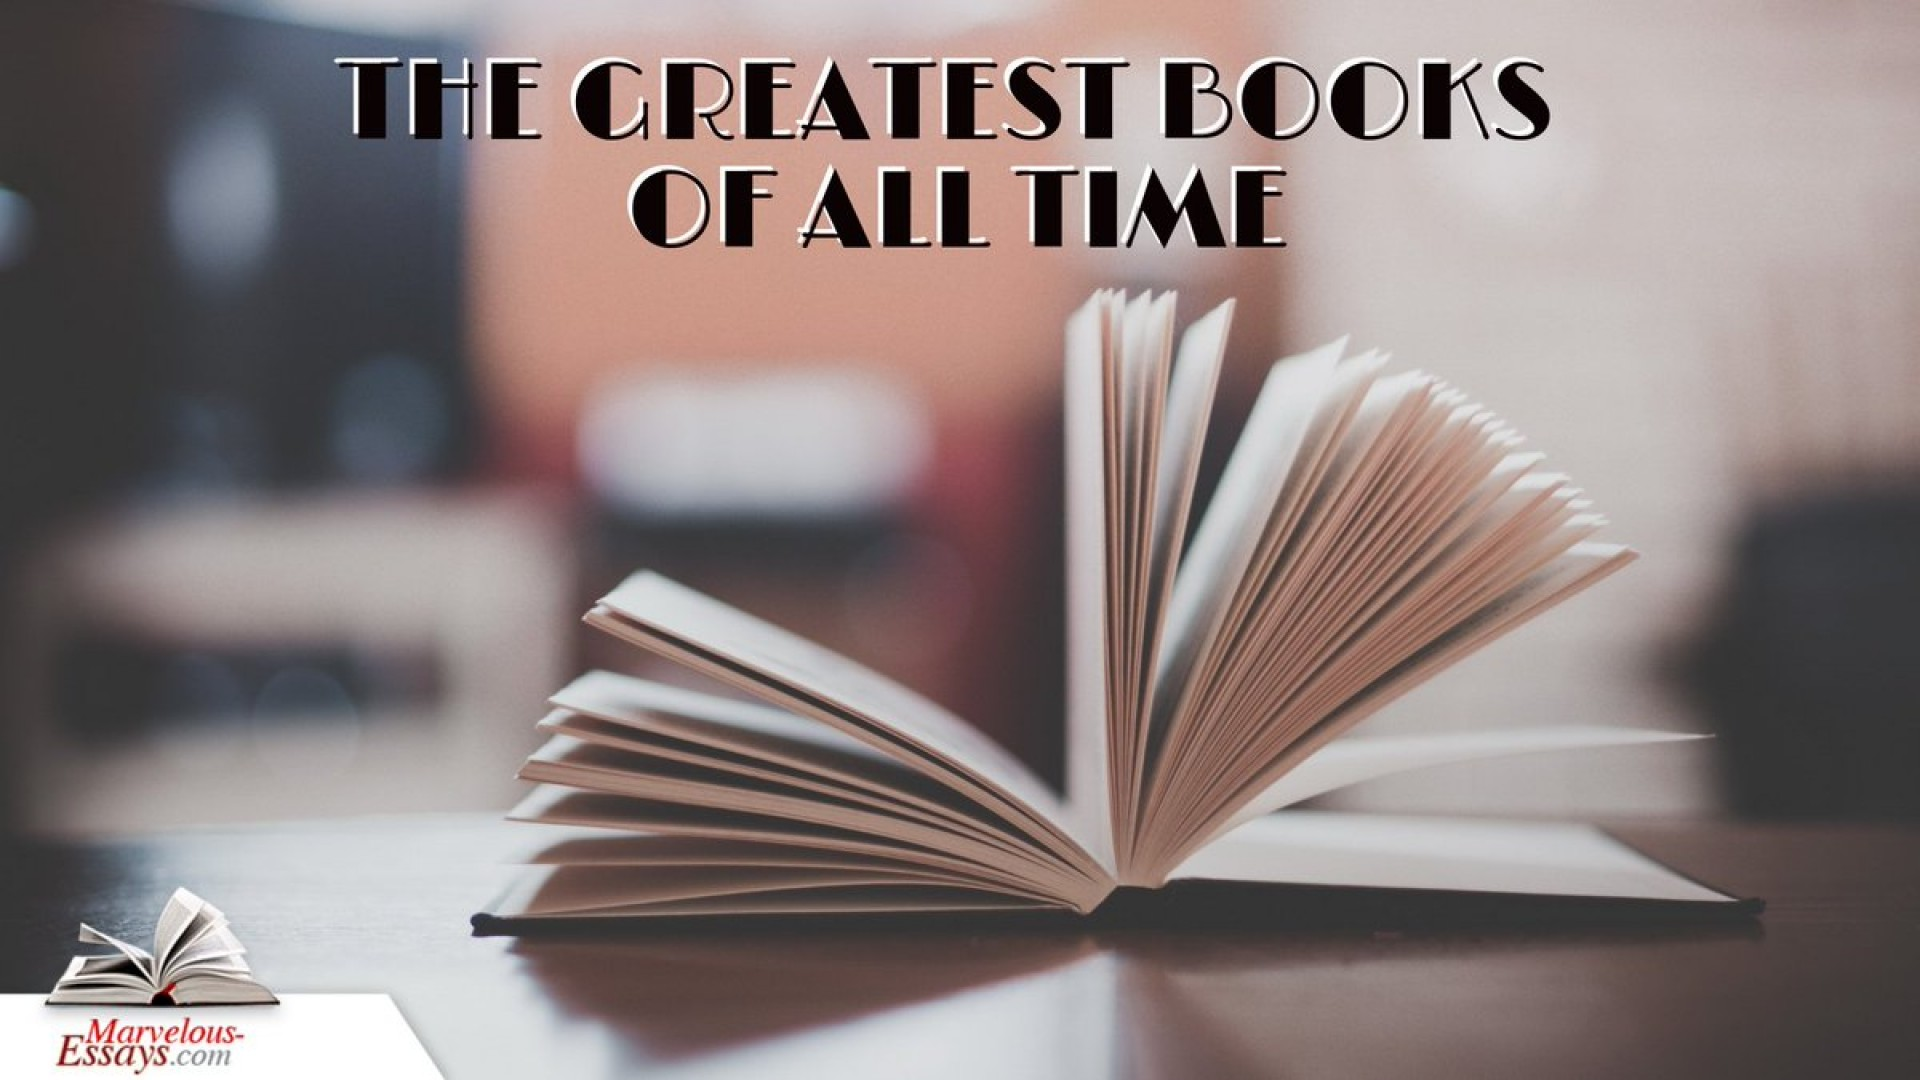 011 Dd3mv2quqaaqpd9 Essay Example Marvelous Breathtaking Essays English Discount Code Uk 1920